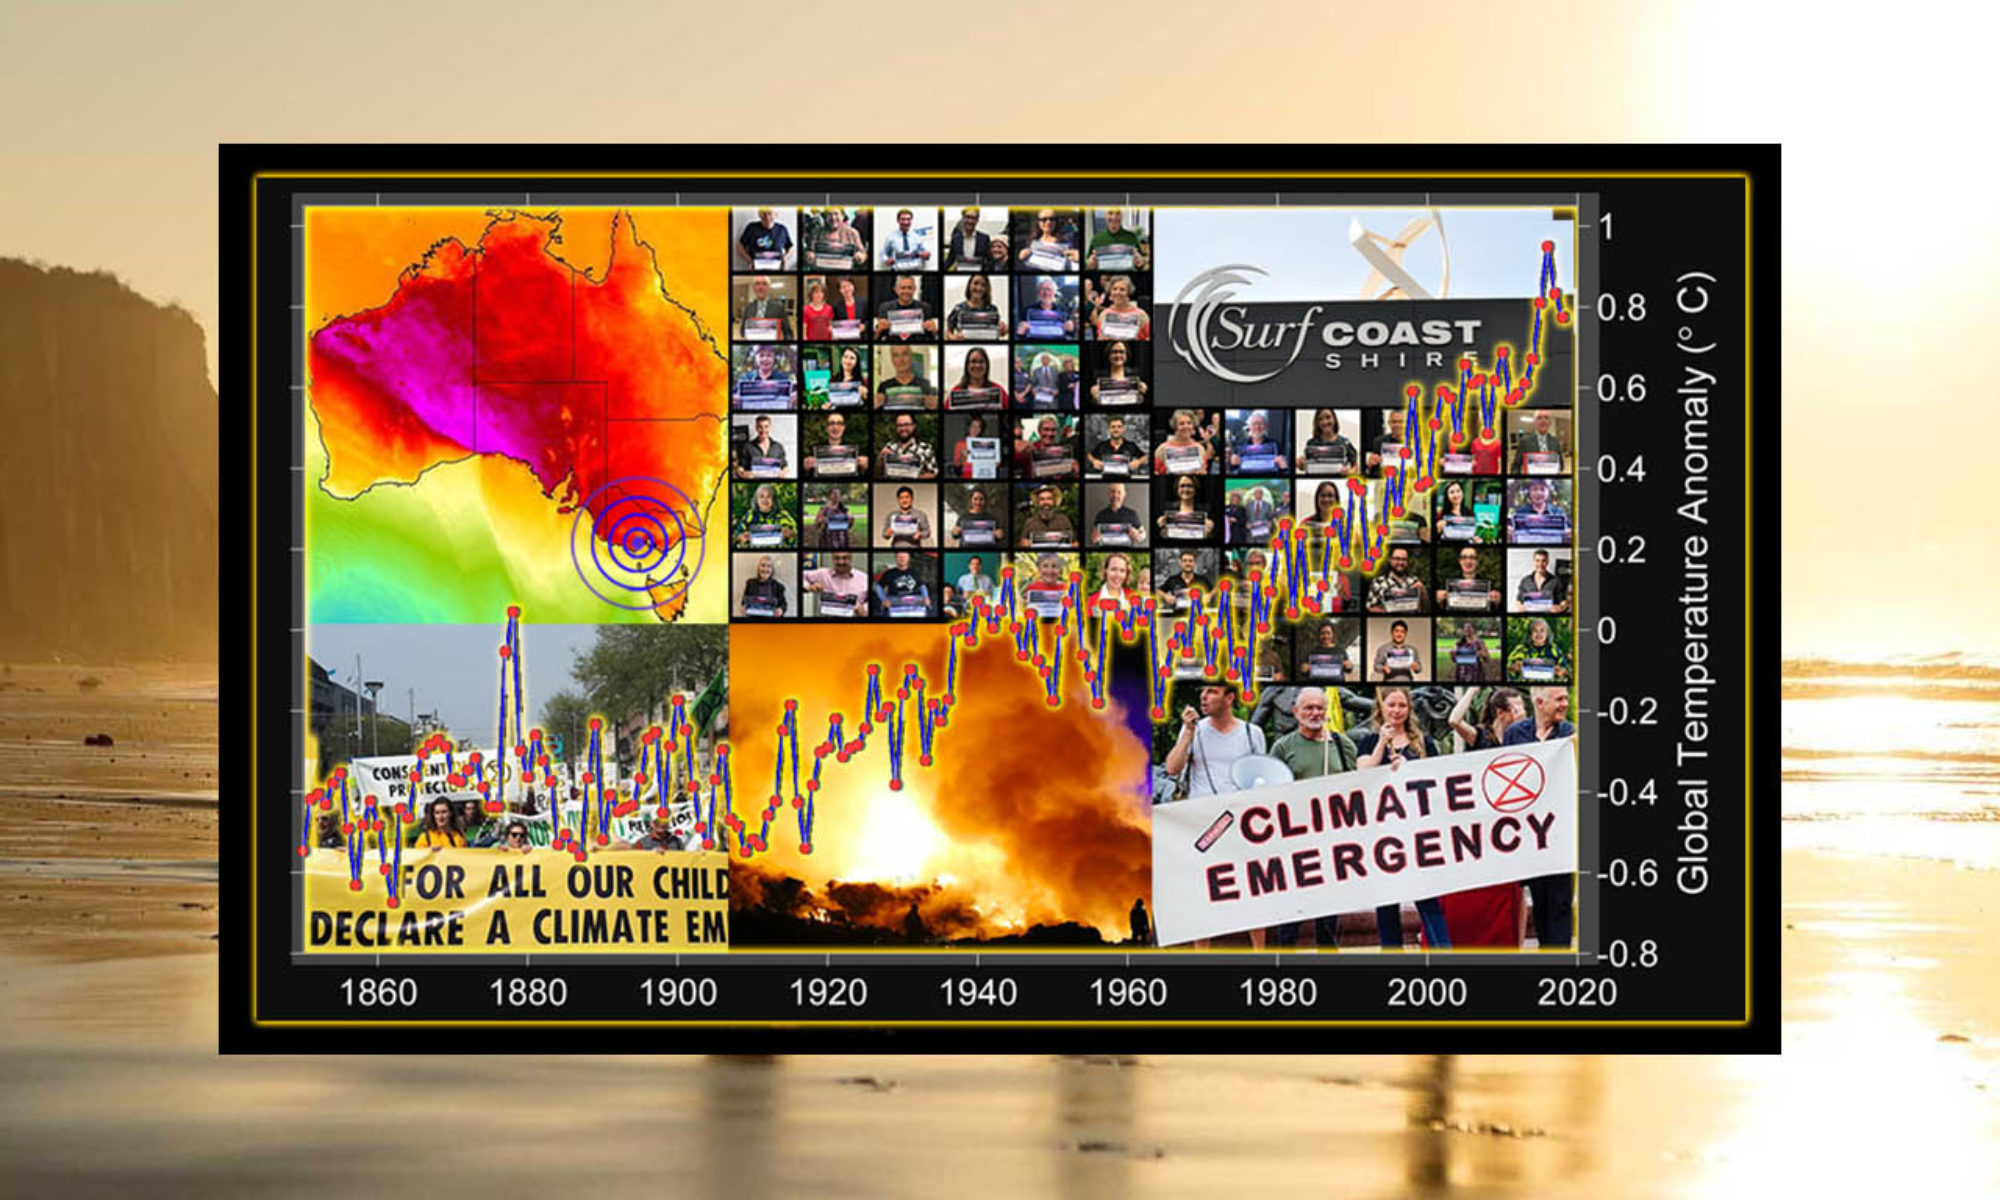 Surf Coast Climate Emergency